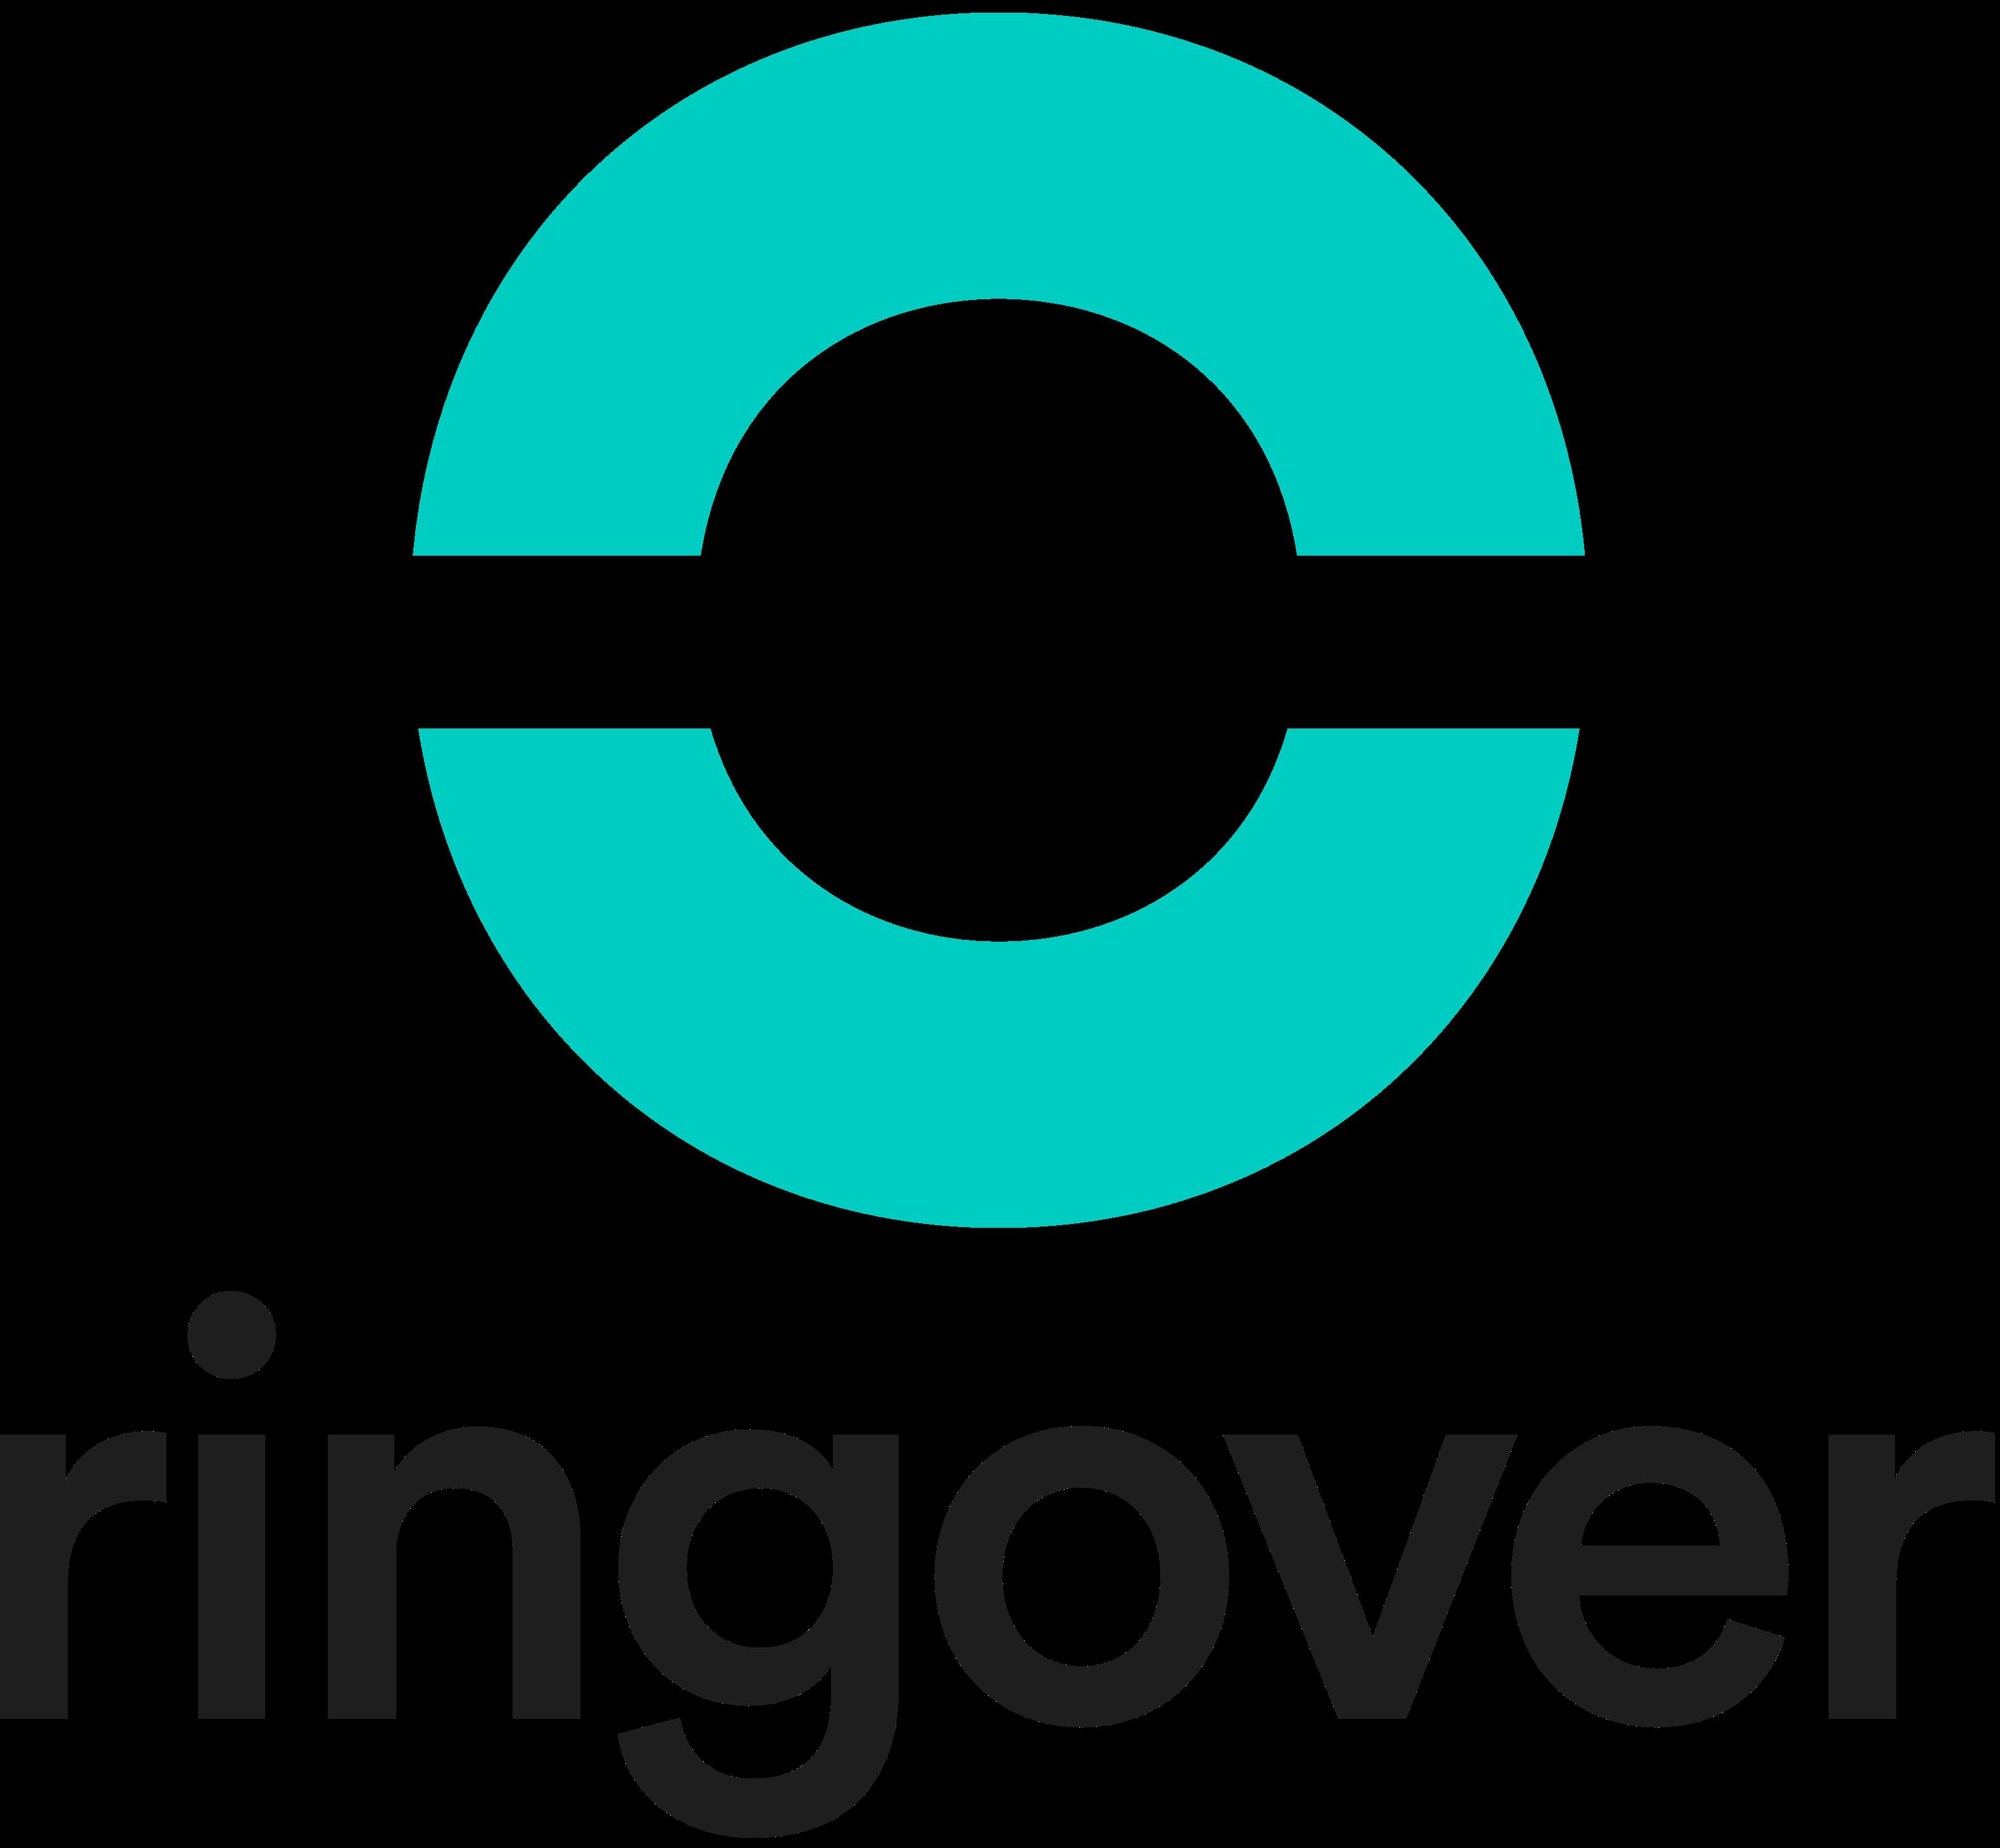 RingOver logo